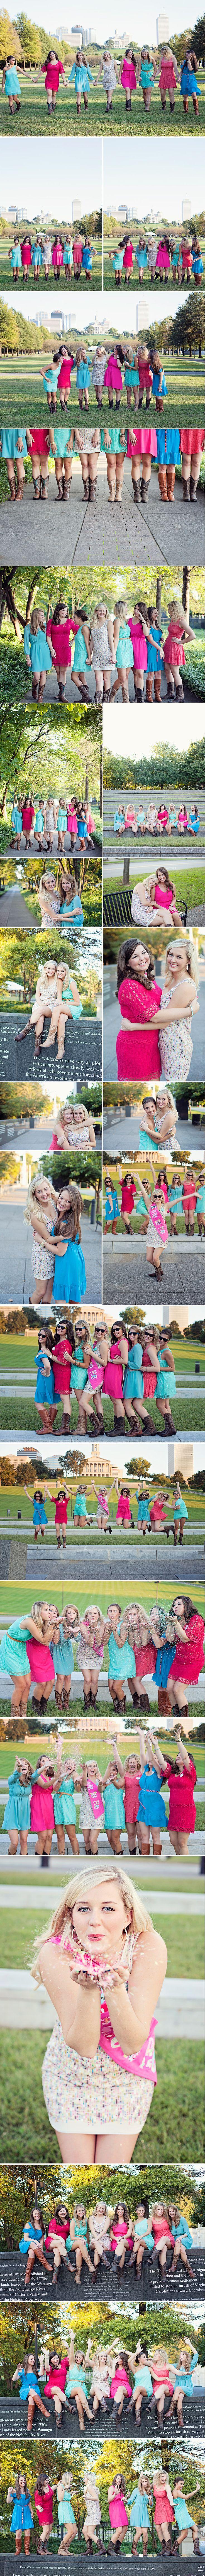 Nashville, TN Wedding and Portrait Photographer | Bachelorette Photoshoot | Abby Demmer